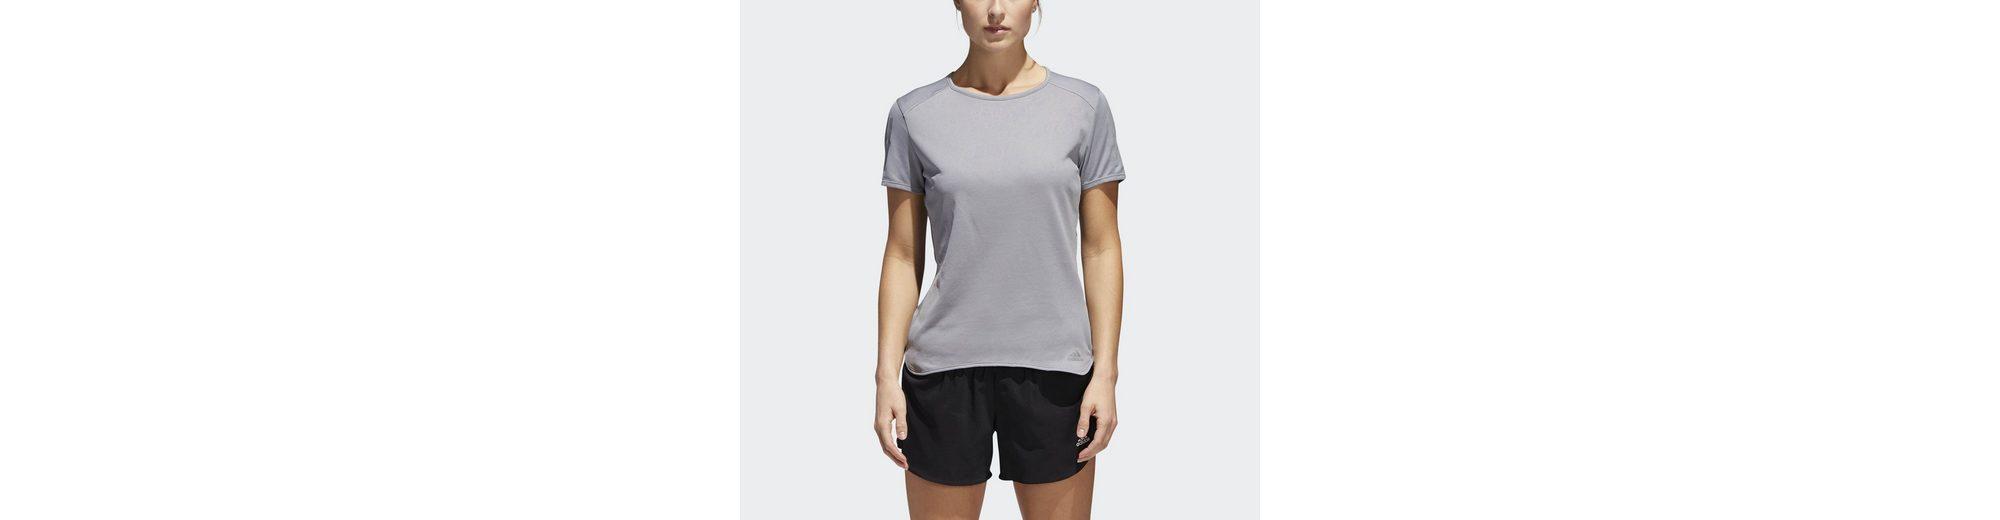 adidas Performance T-Shirt Response T-shirt